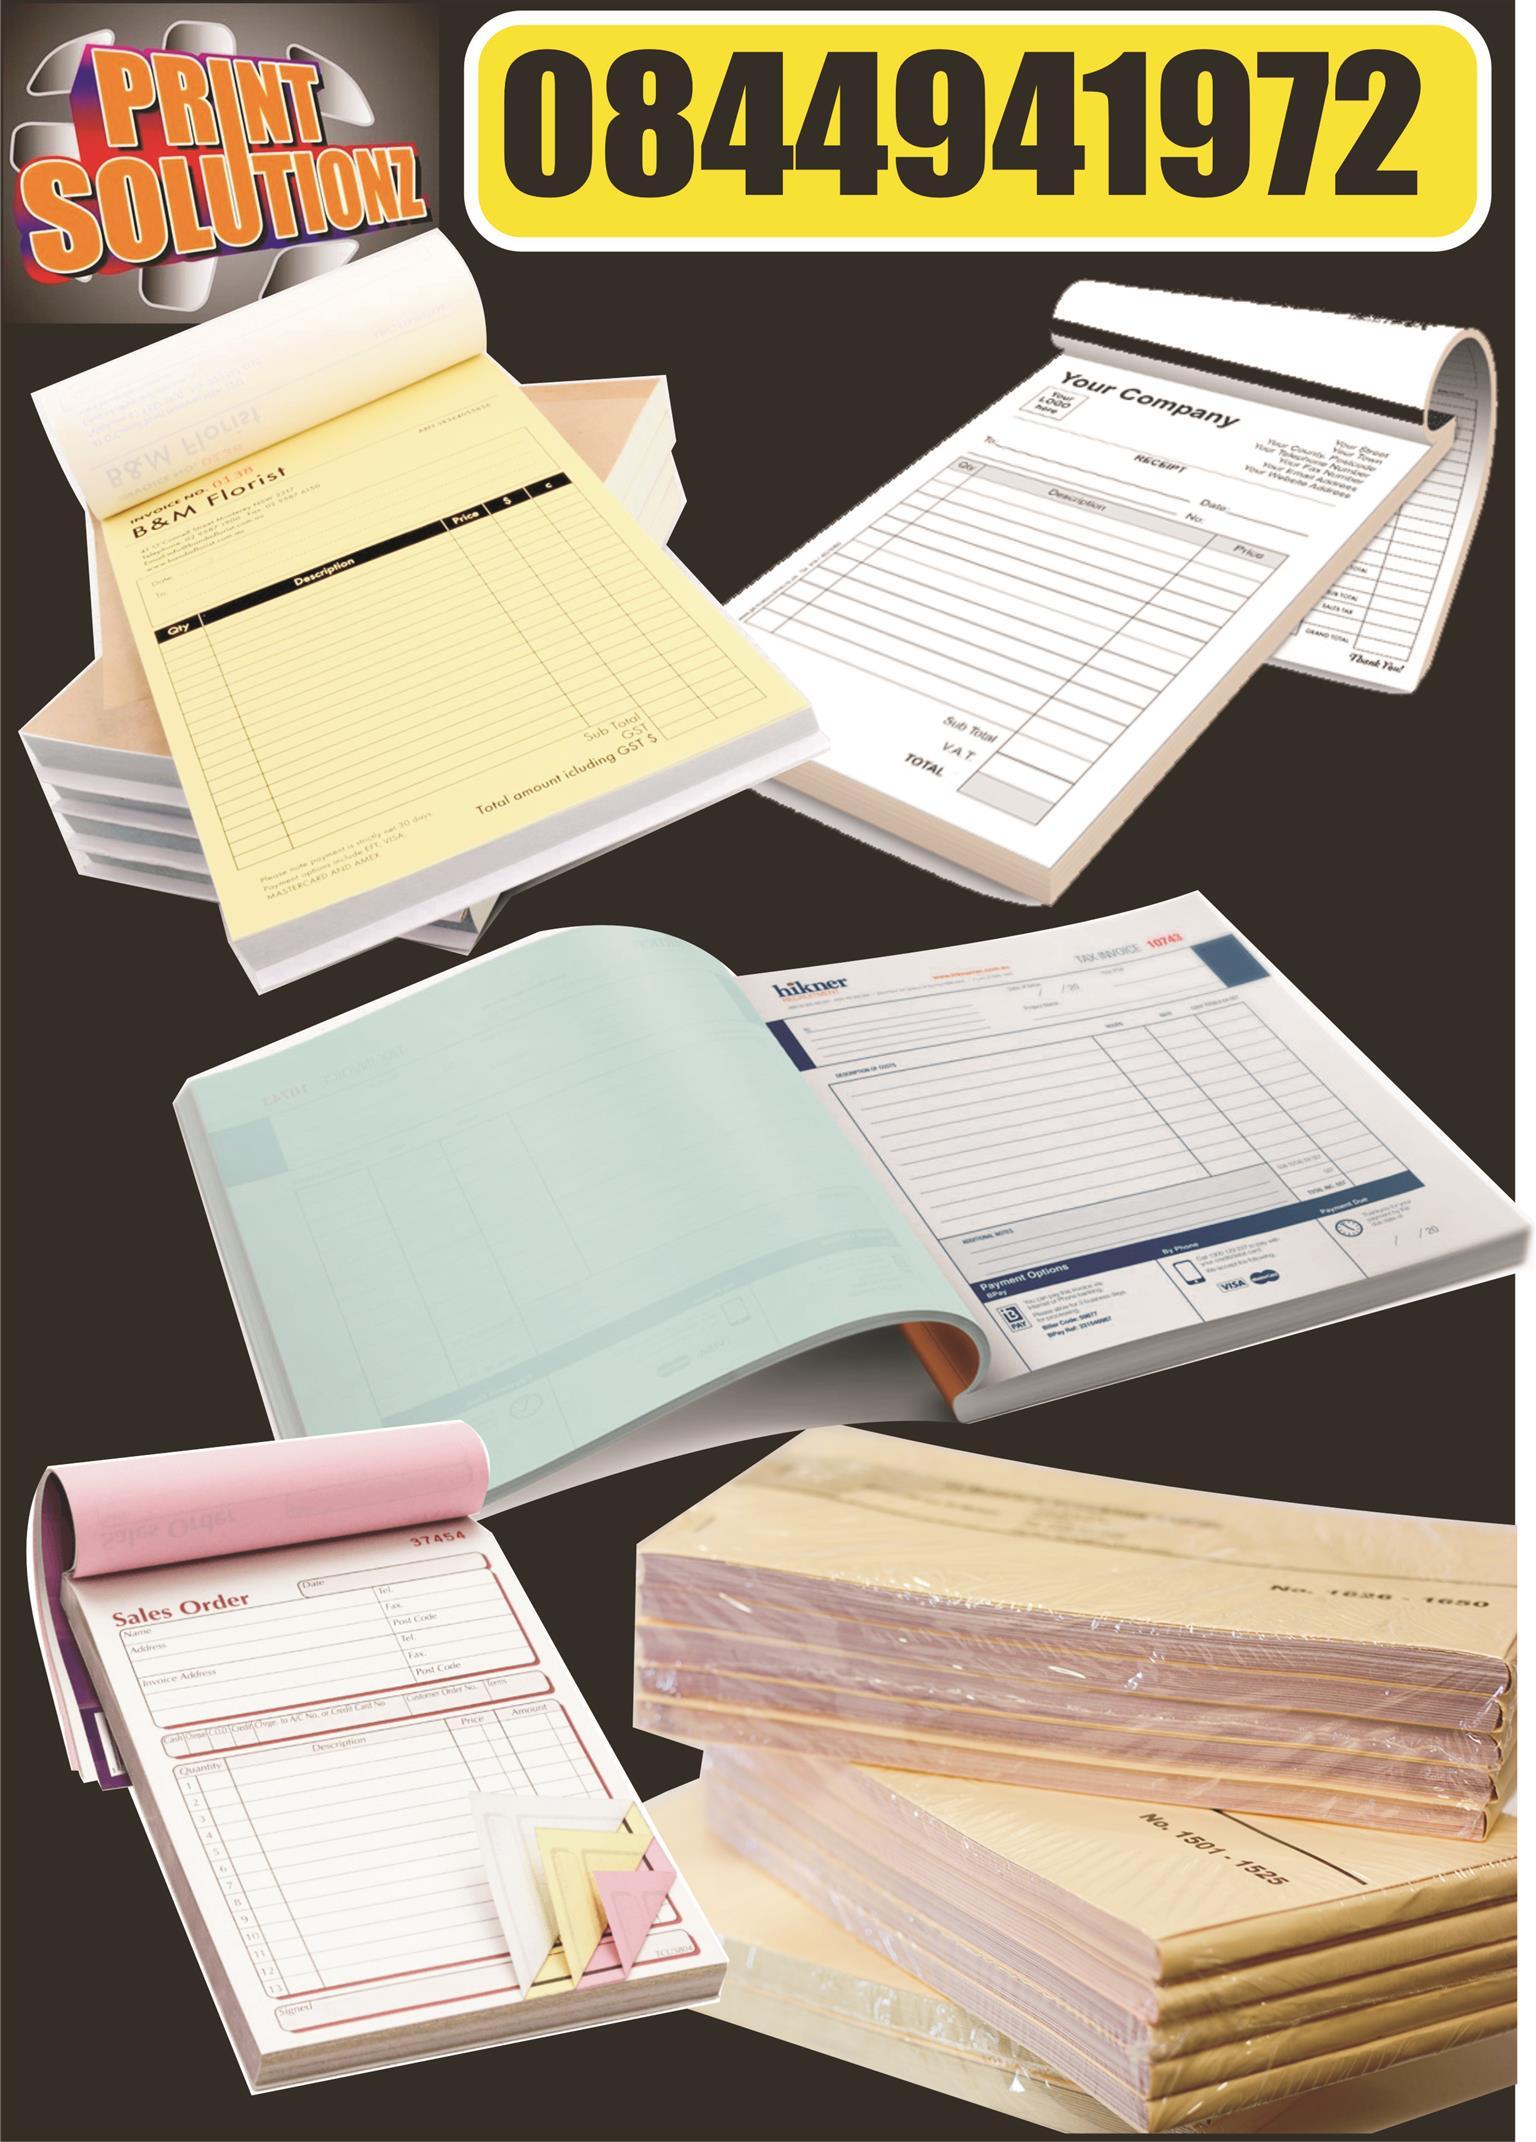 Invoice books and copy paper